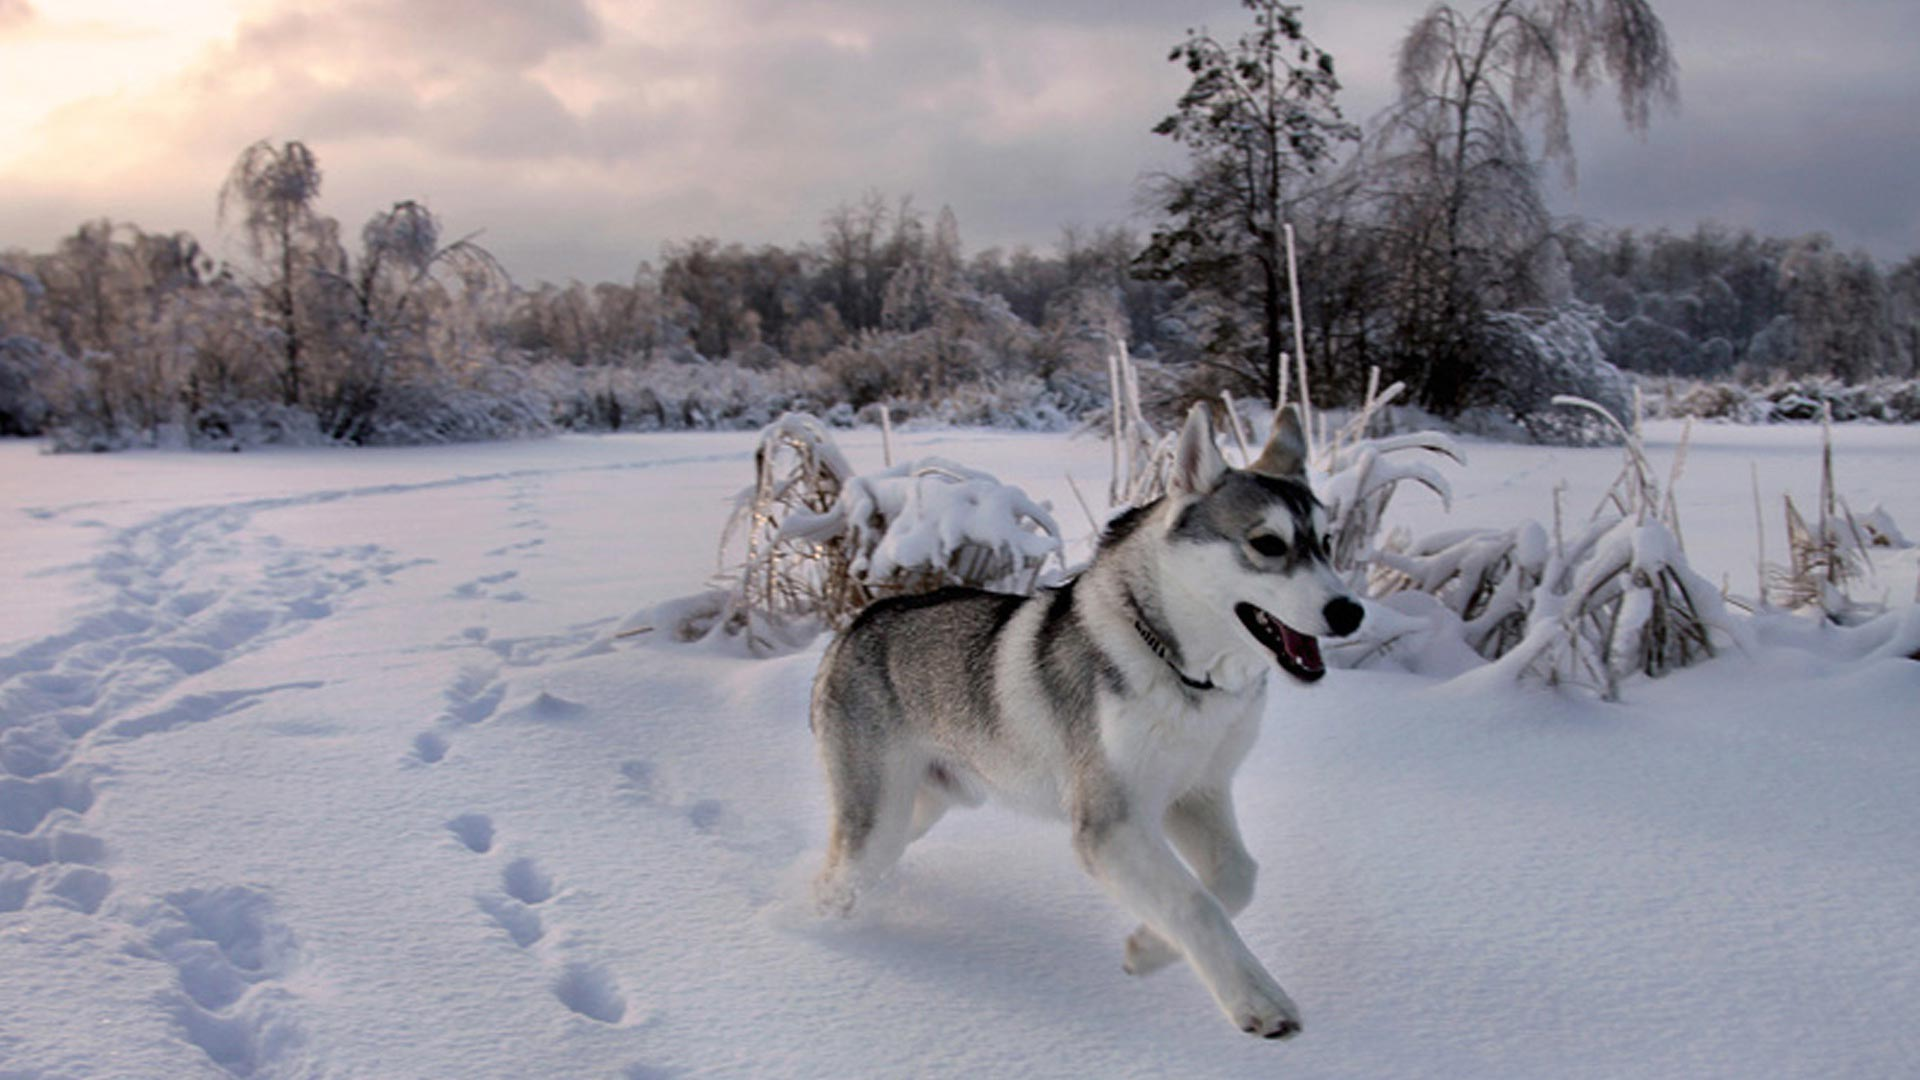 Обои Снежный Хаски, картинки - Обои для ...: www.fullhdoboi.ru/photo/dogs/snezhnyj_khaski/30-0-22135